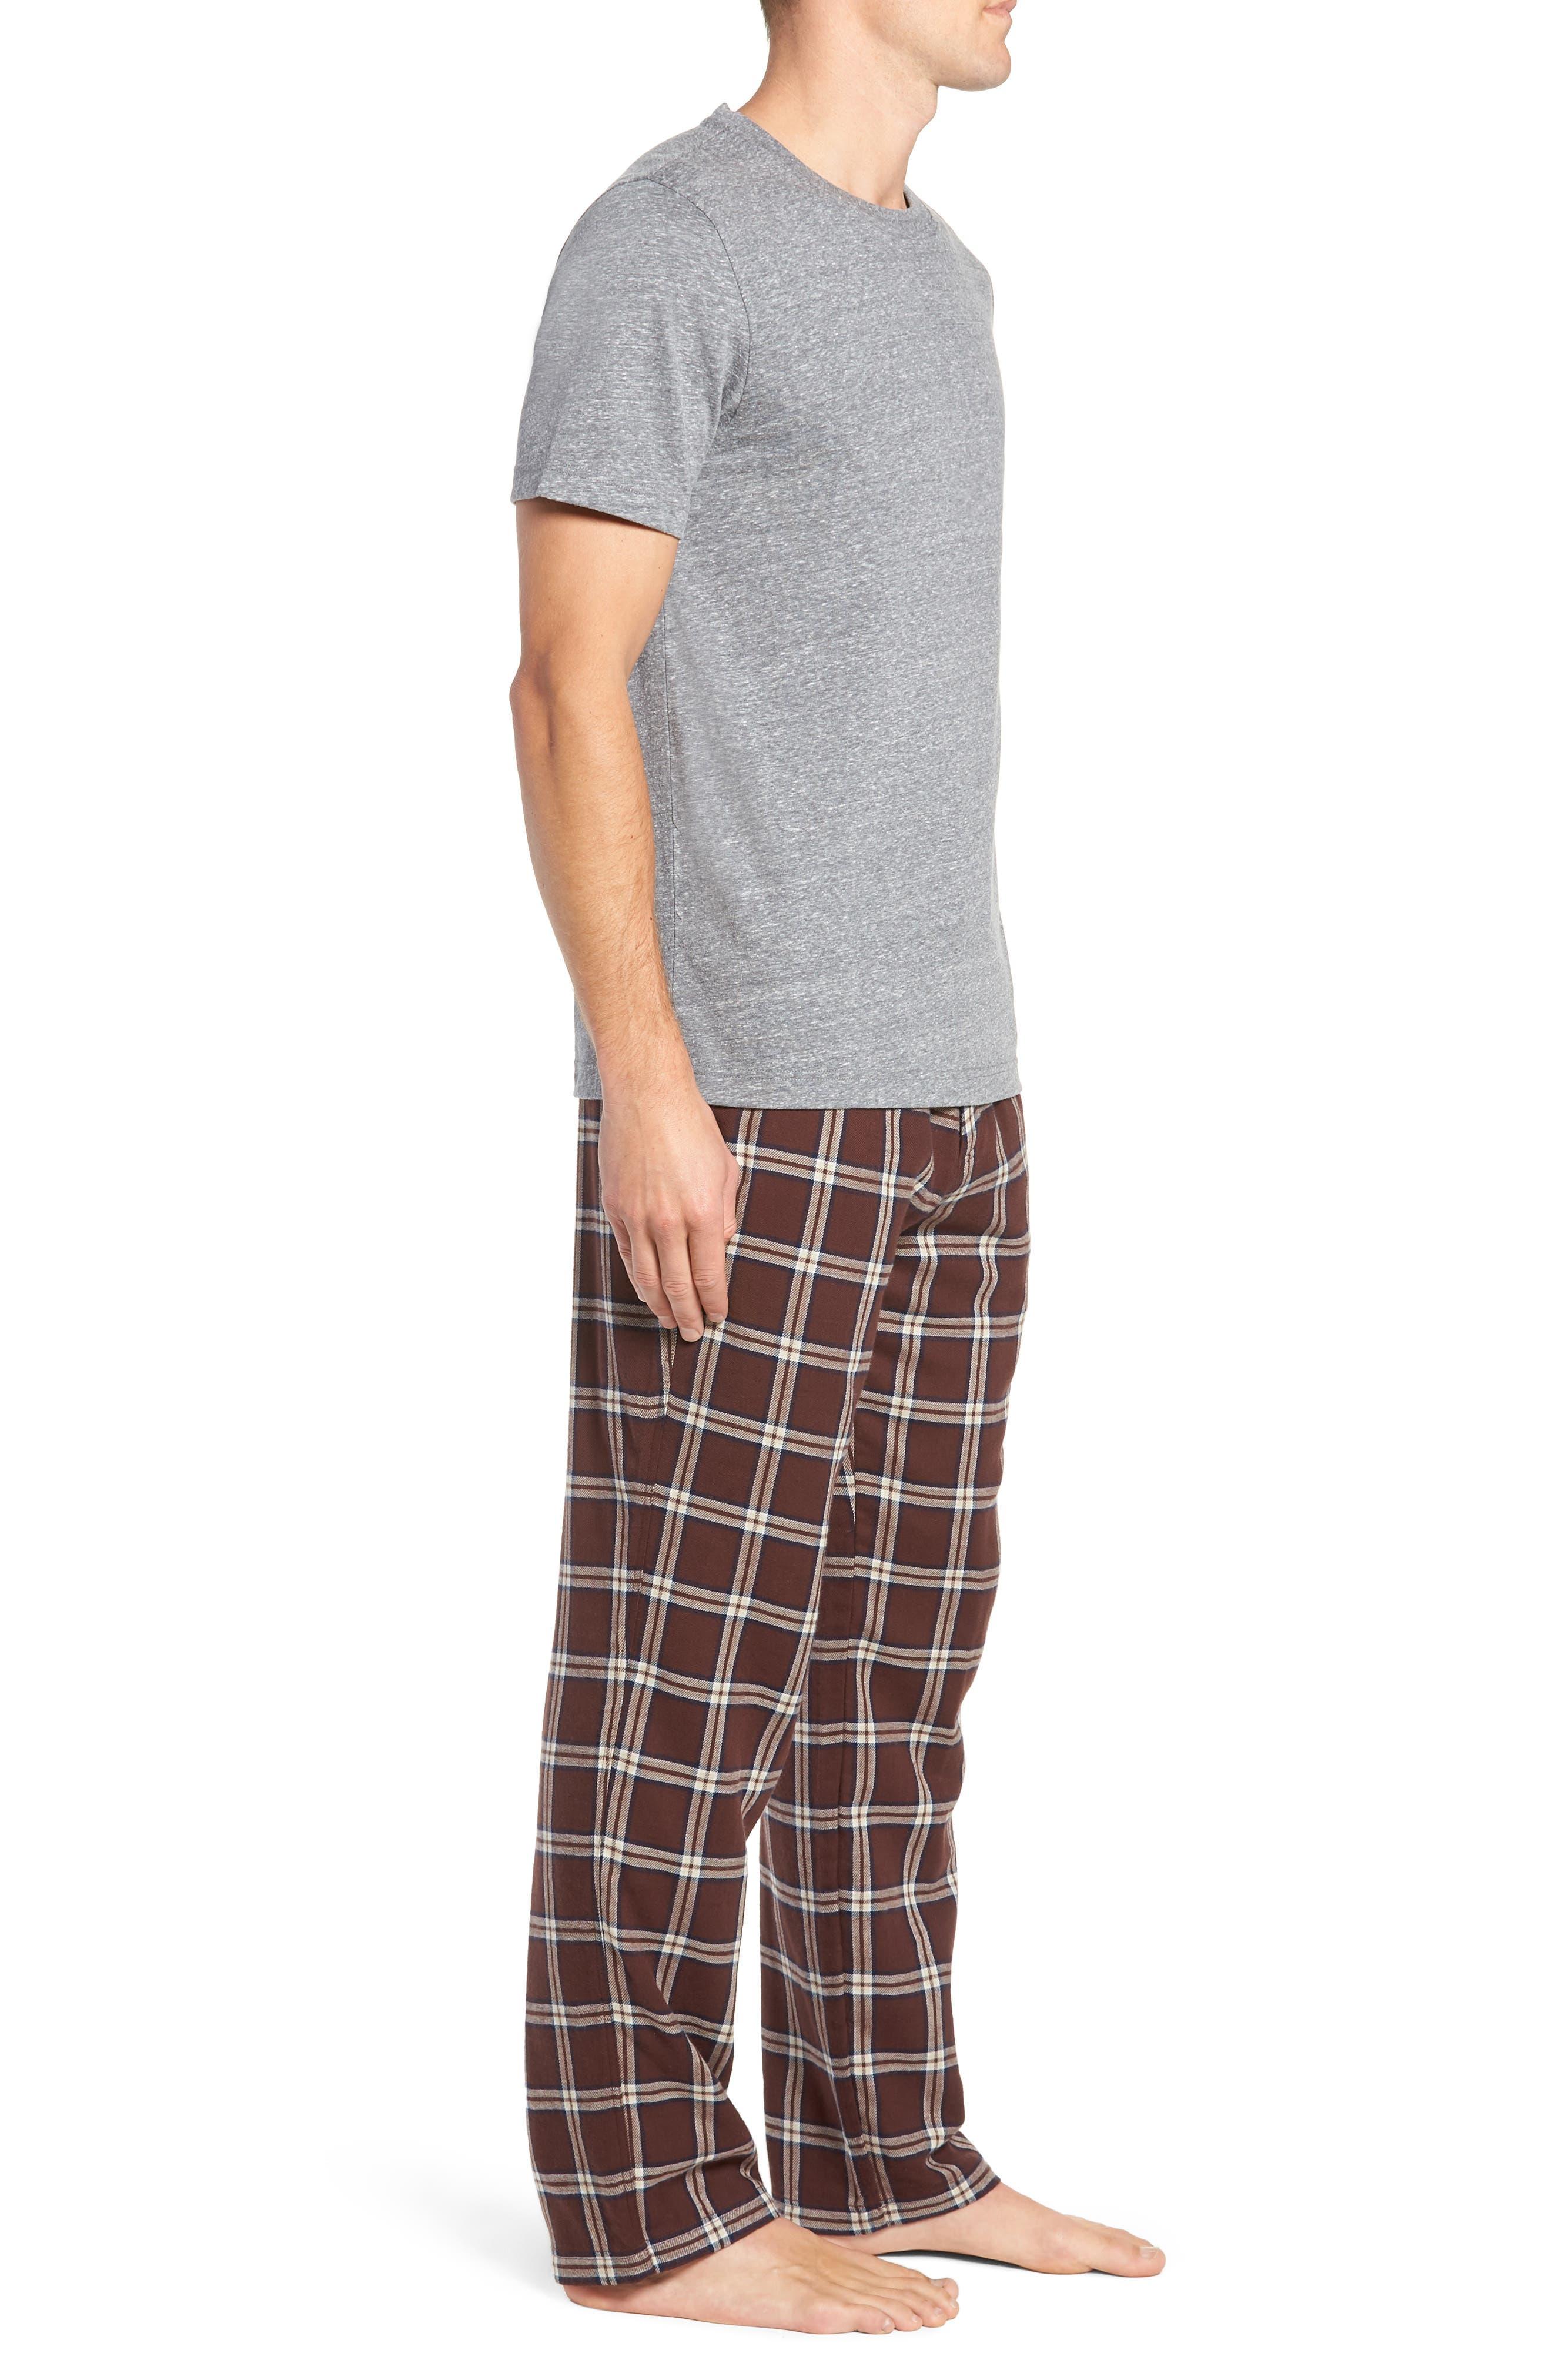 Grant Pajama Set,                             Alternate thumbnail 3, color,                             PORT/ GREY HEATHER